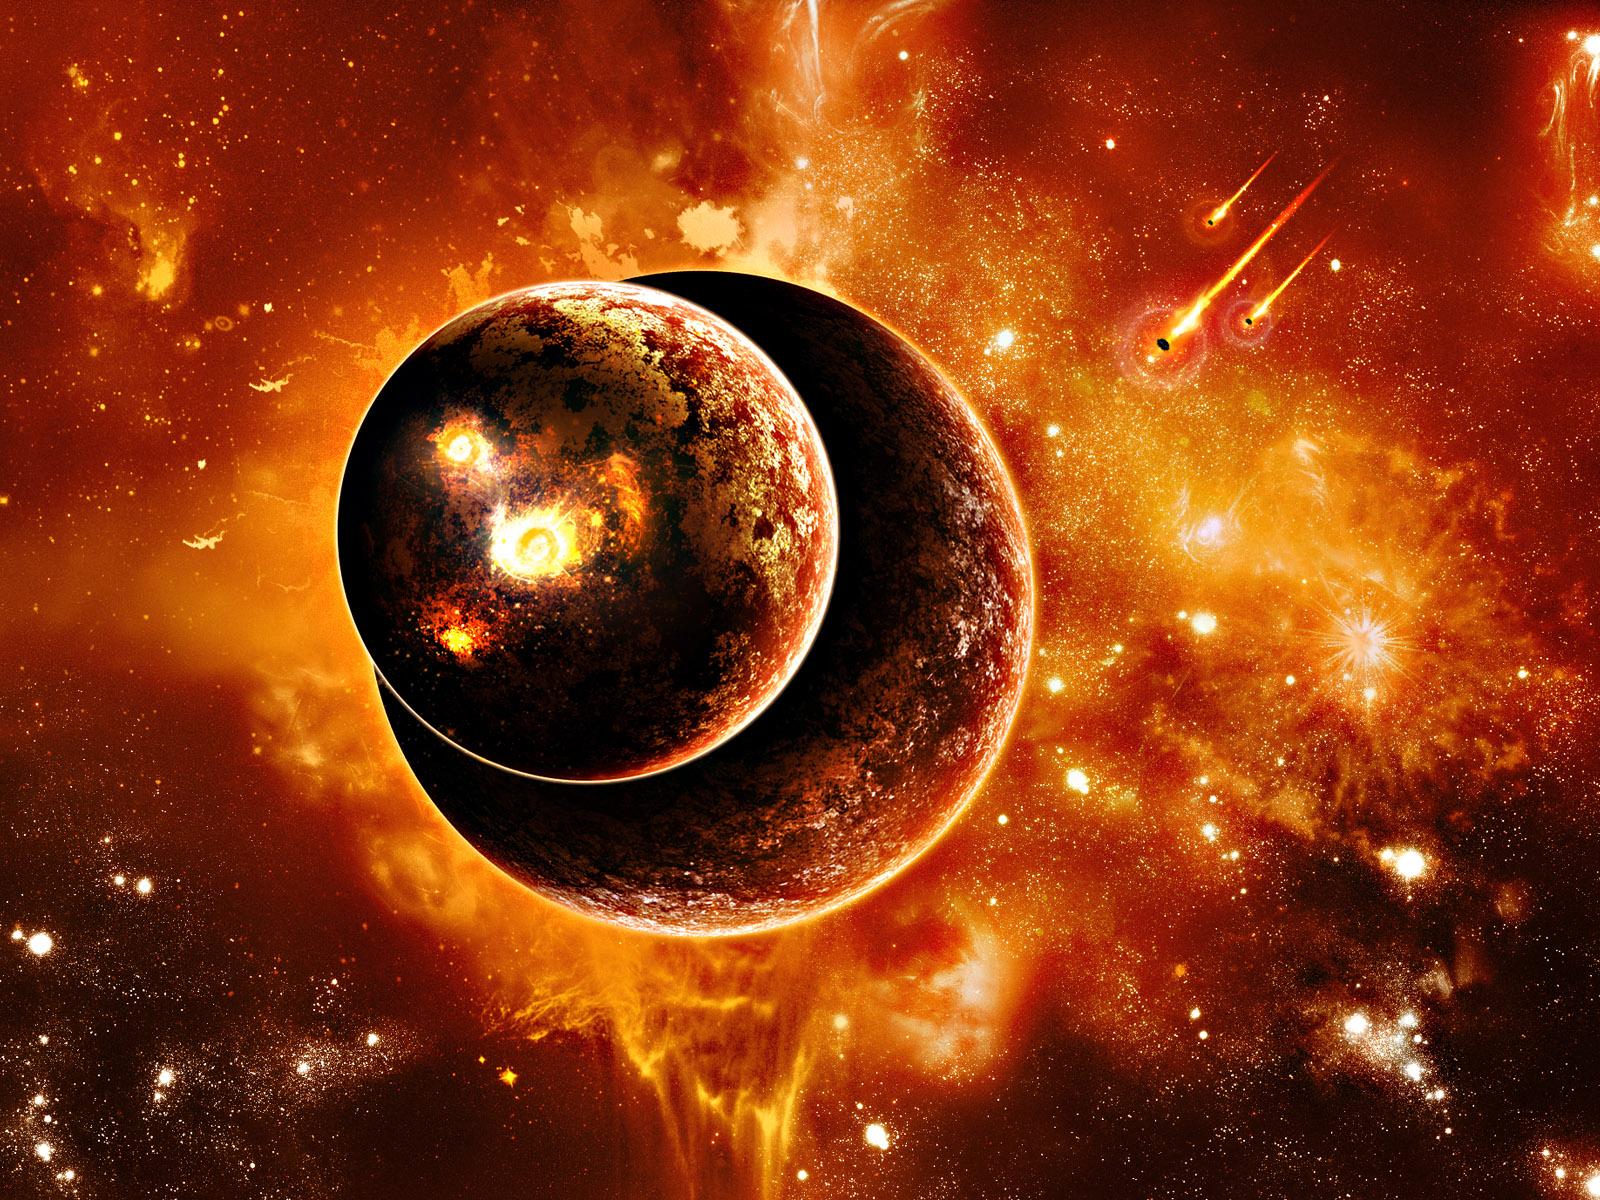 http://3.bp.blogspot.com/-cWeE8CuDg1w/TnoeqcuLVdI/AAAAAAAAAR0/s5mS18Oe76Q/s1600/planets_burning-normal.jpg